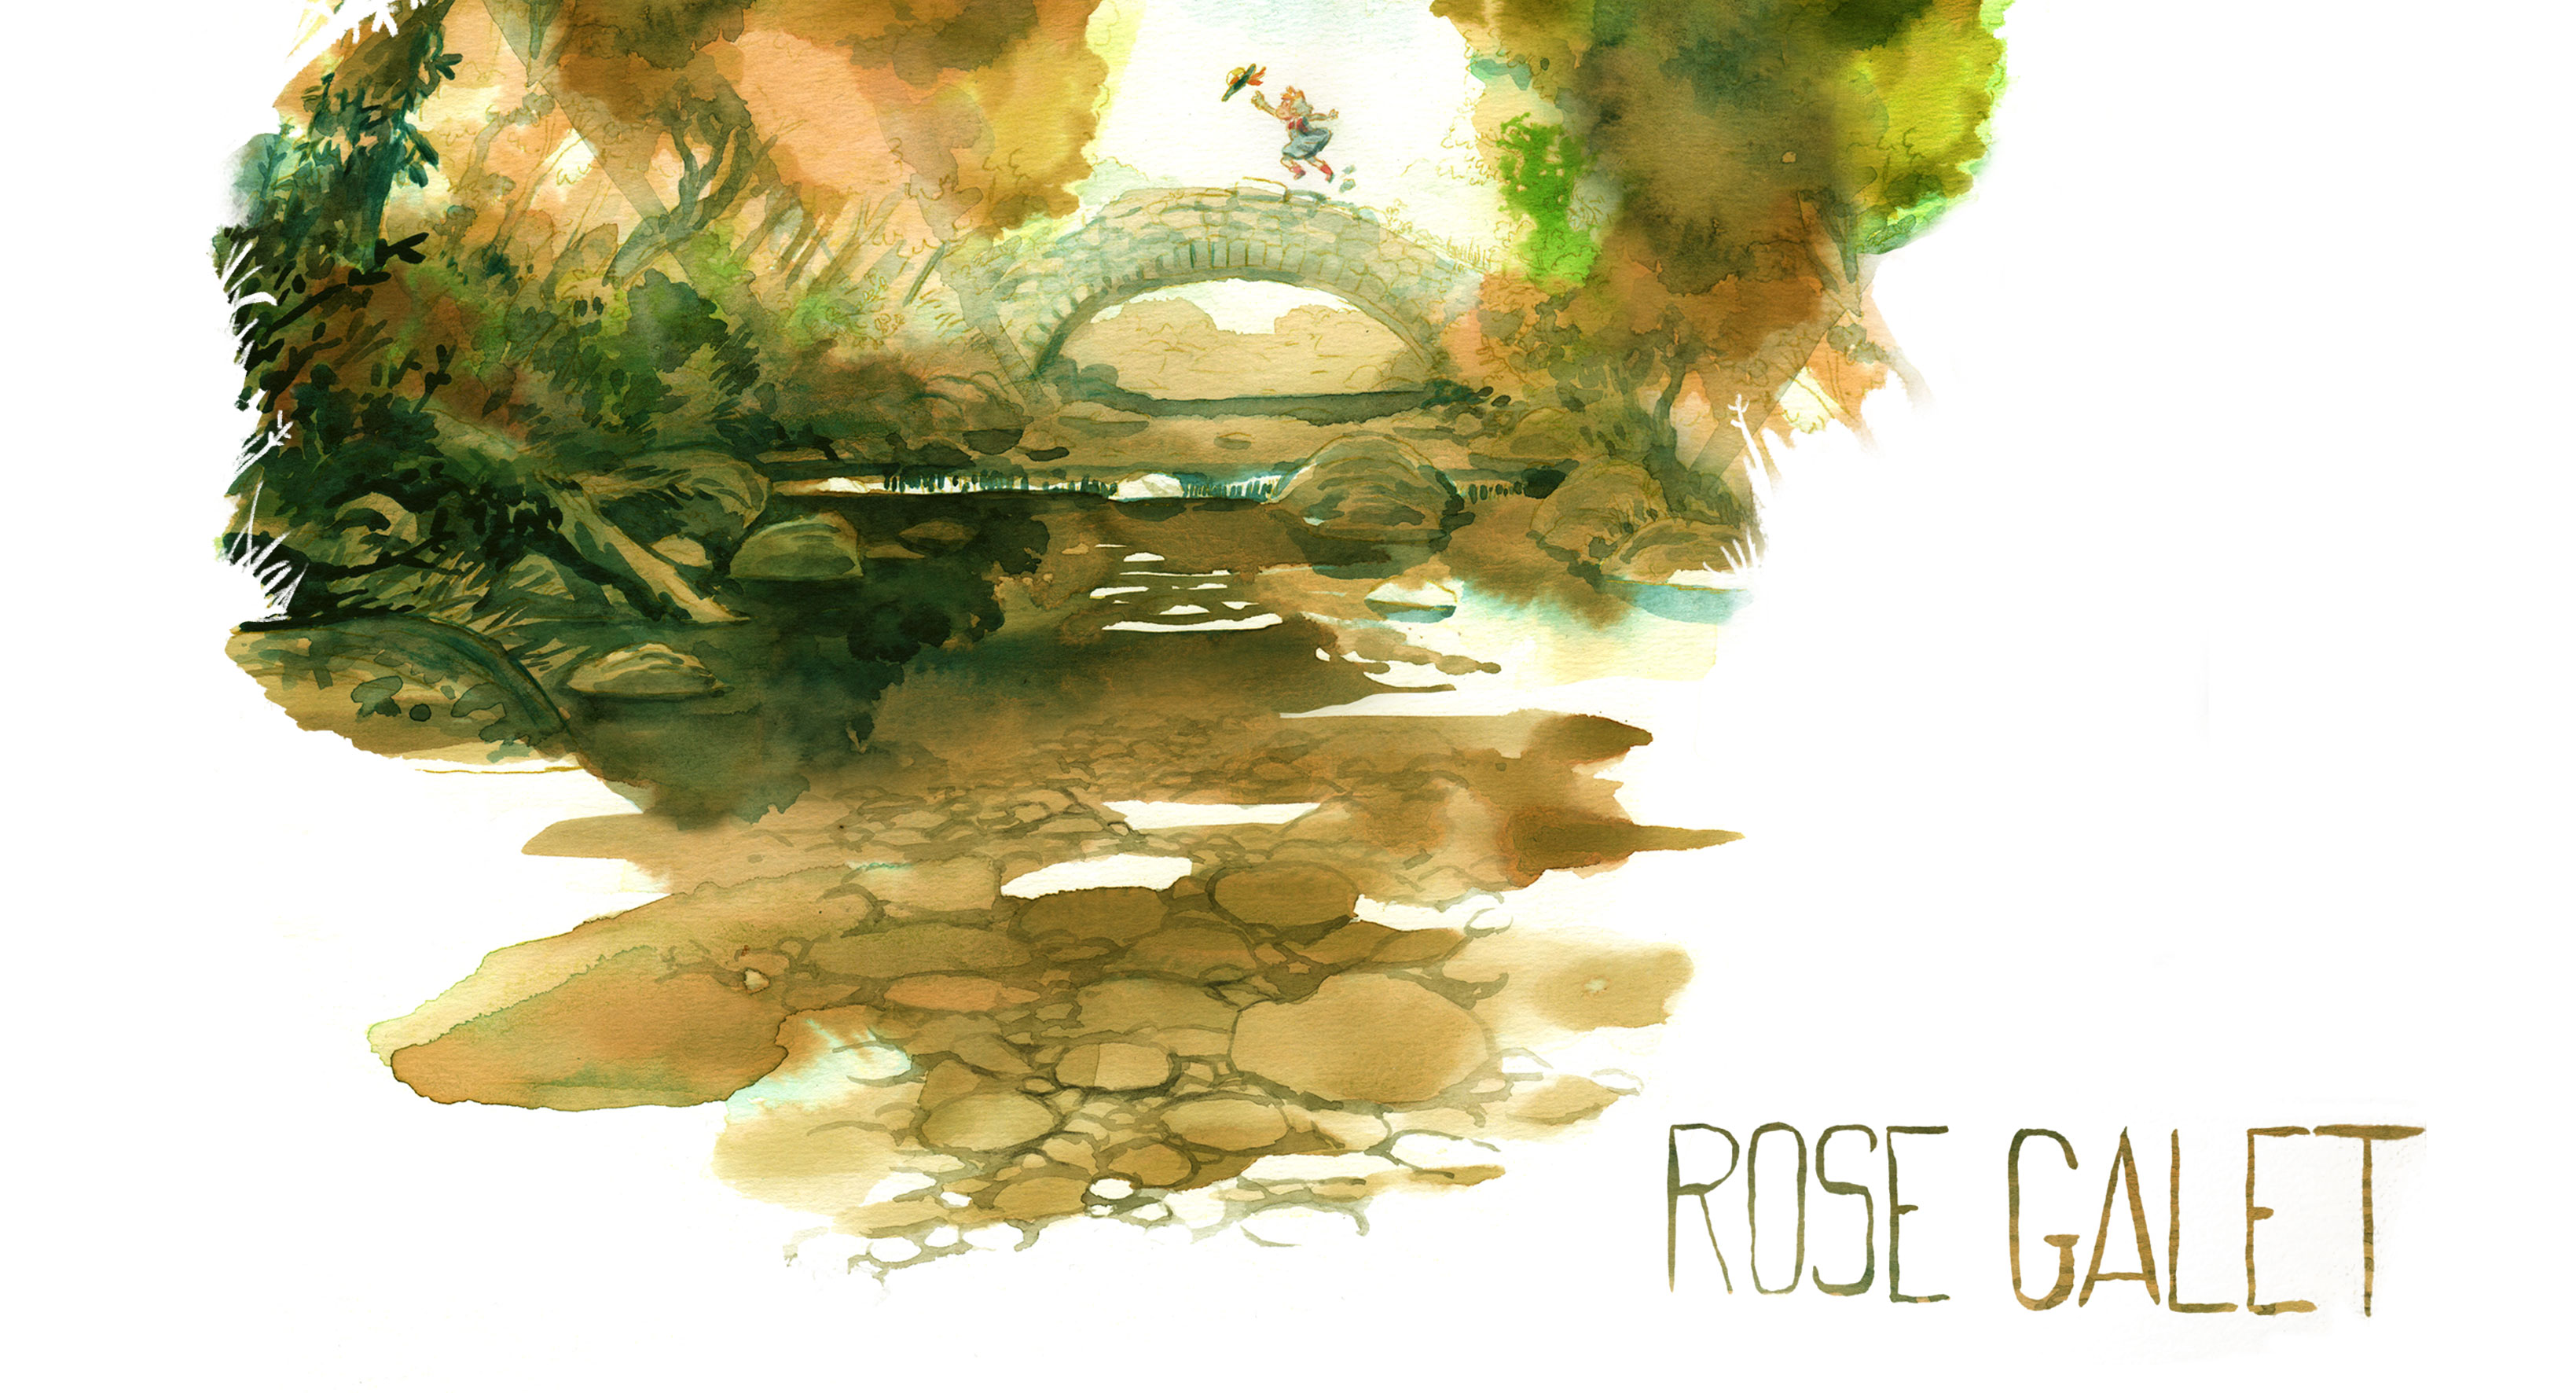 Rose Galet